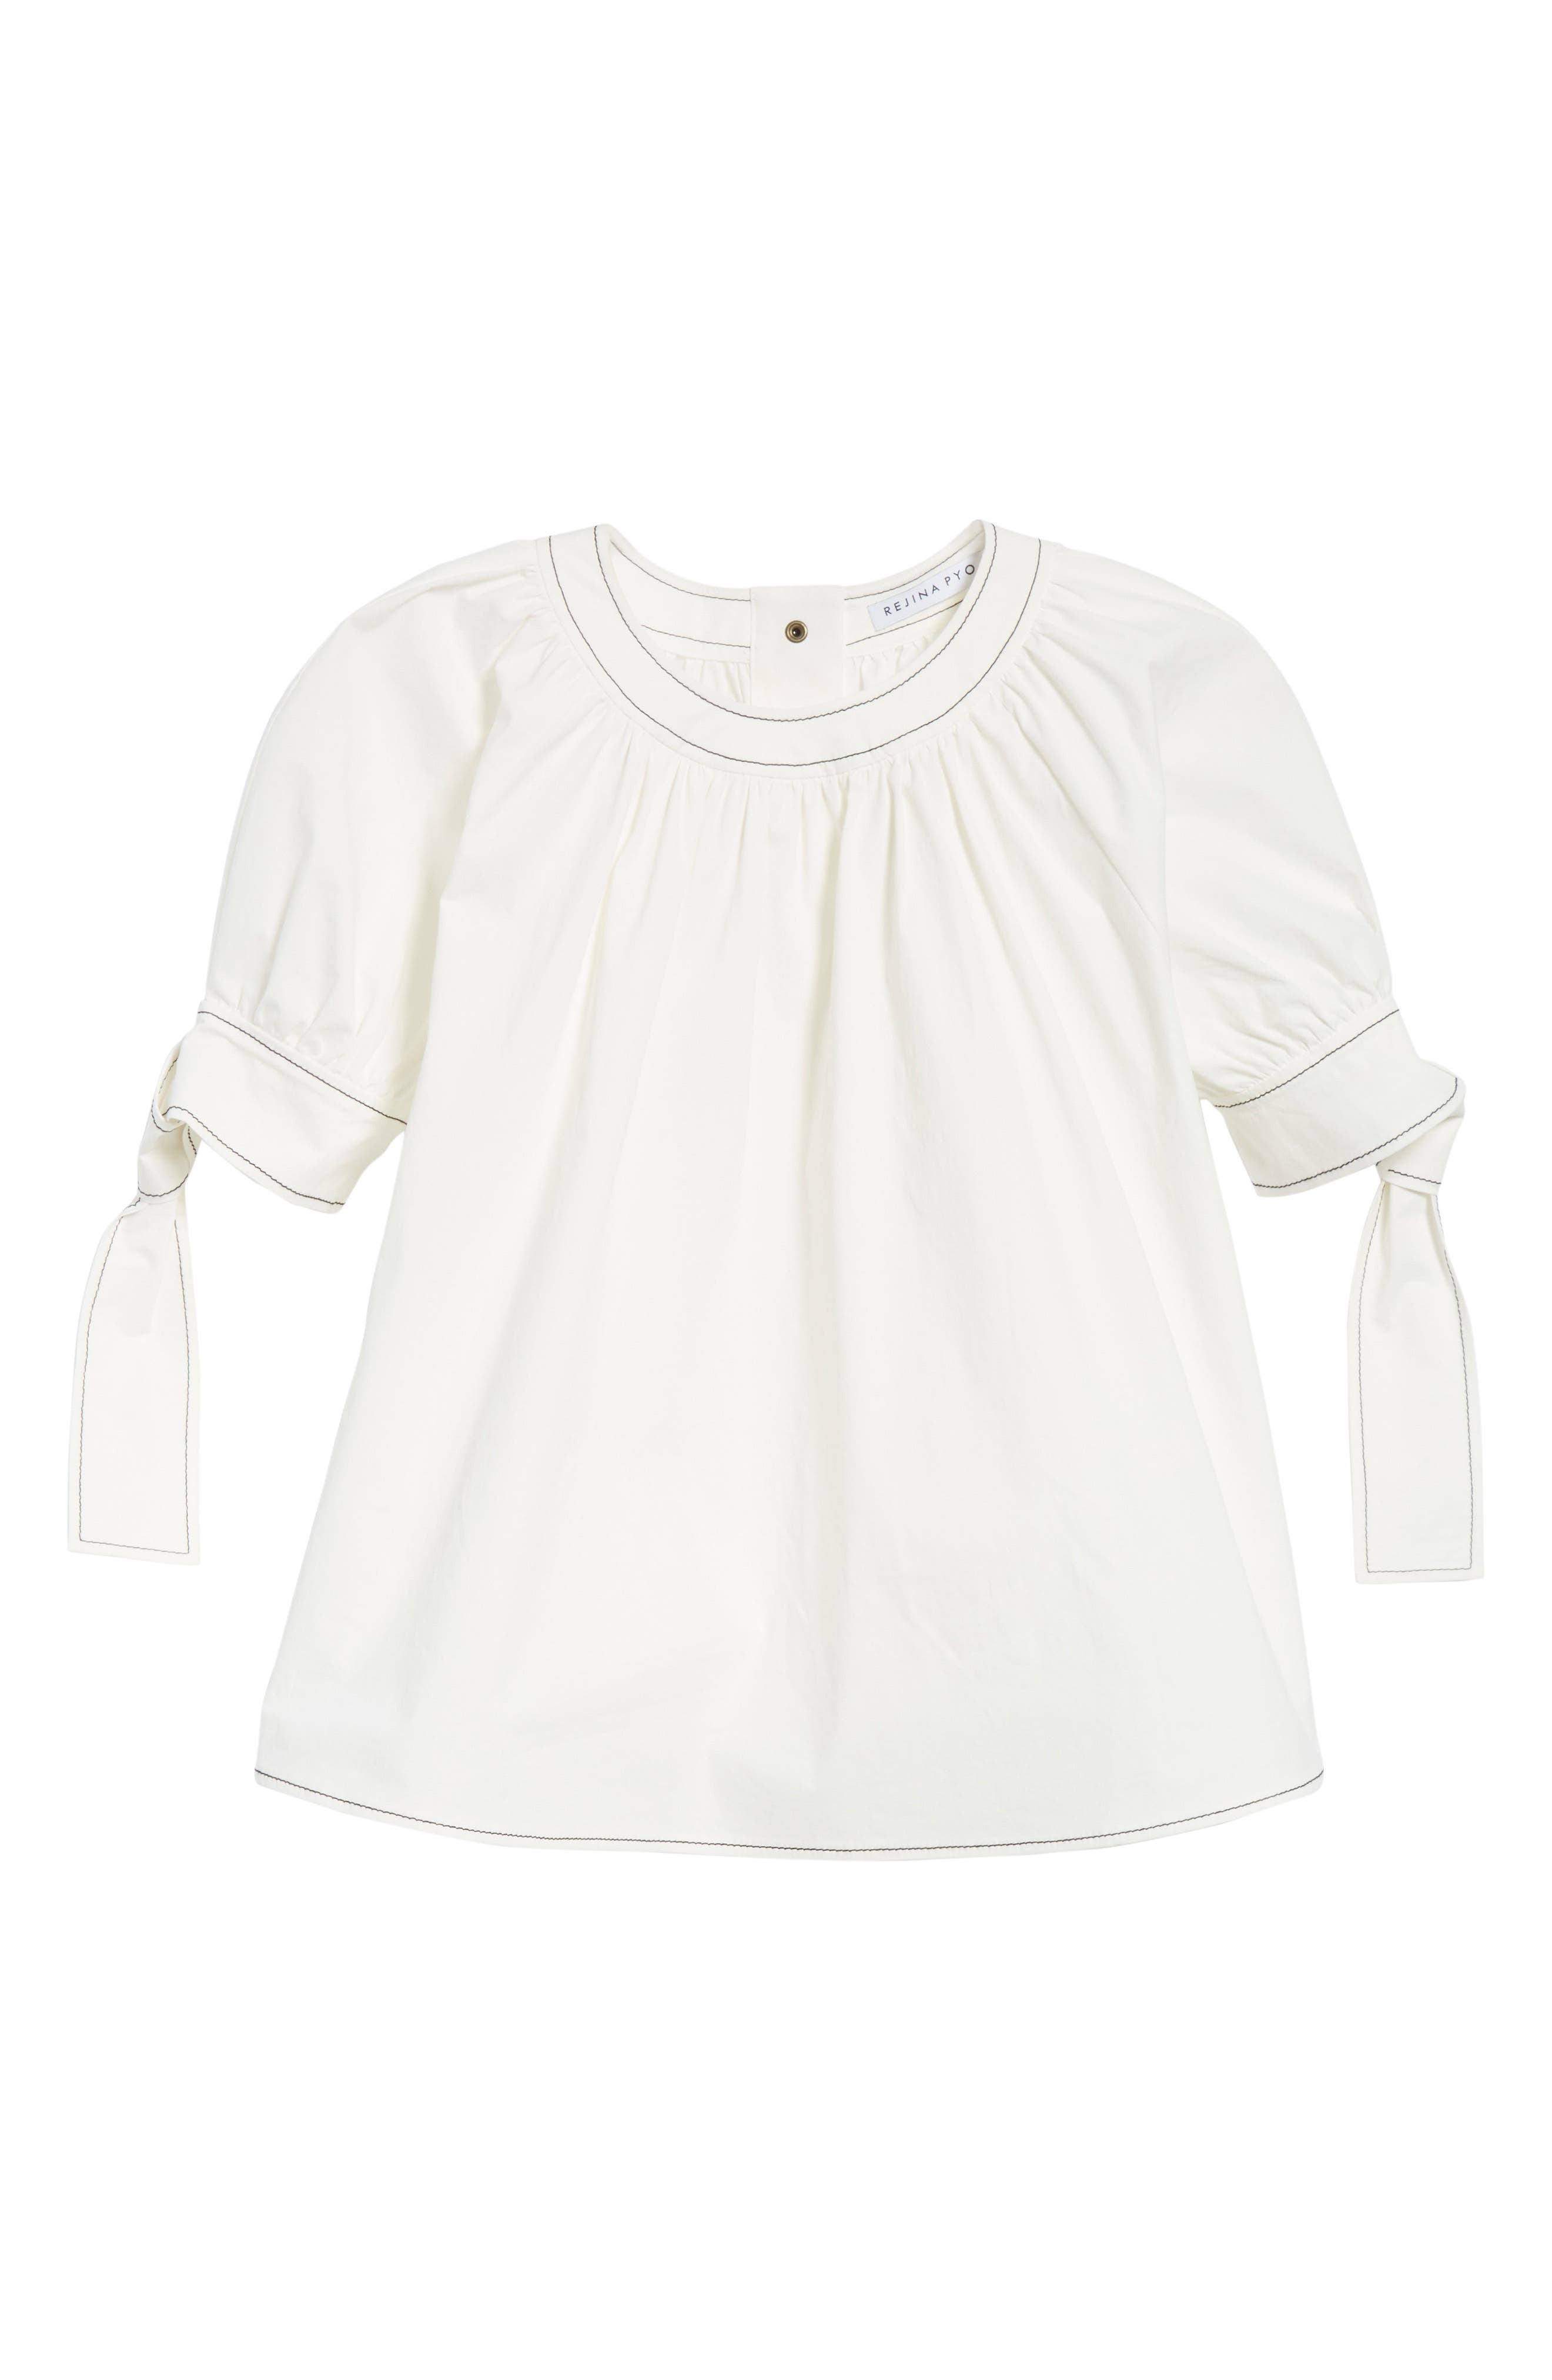 Hailey Short Sleeve Blouse Top,                             Alternate thumbnail 6, color,                             100